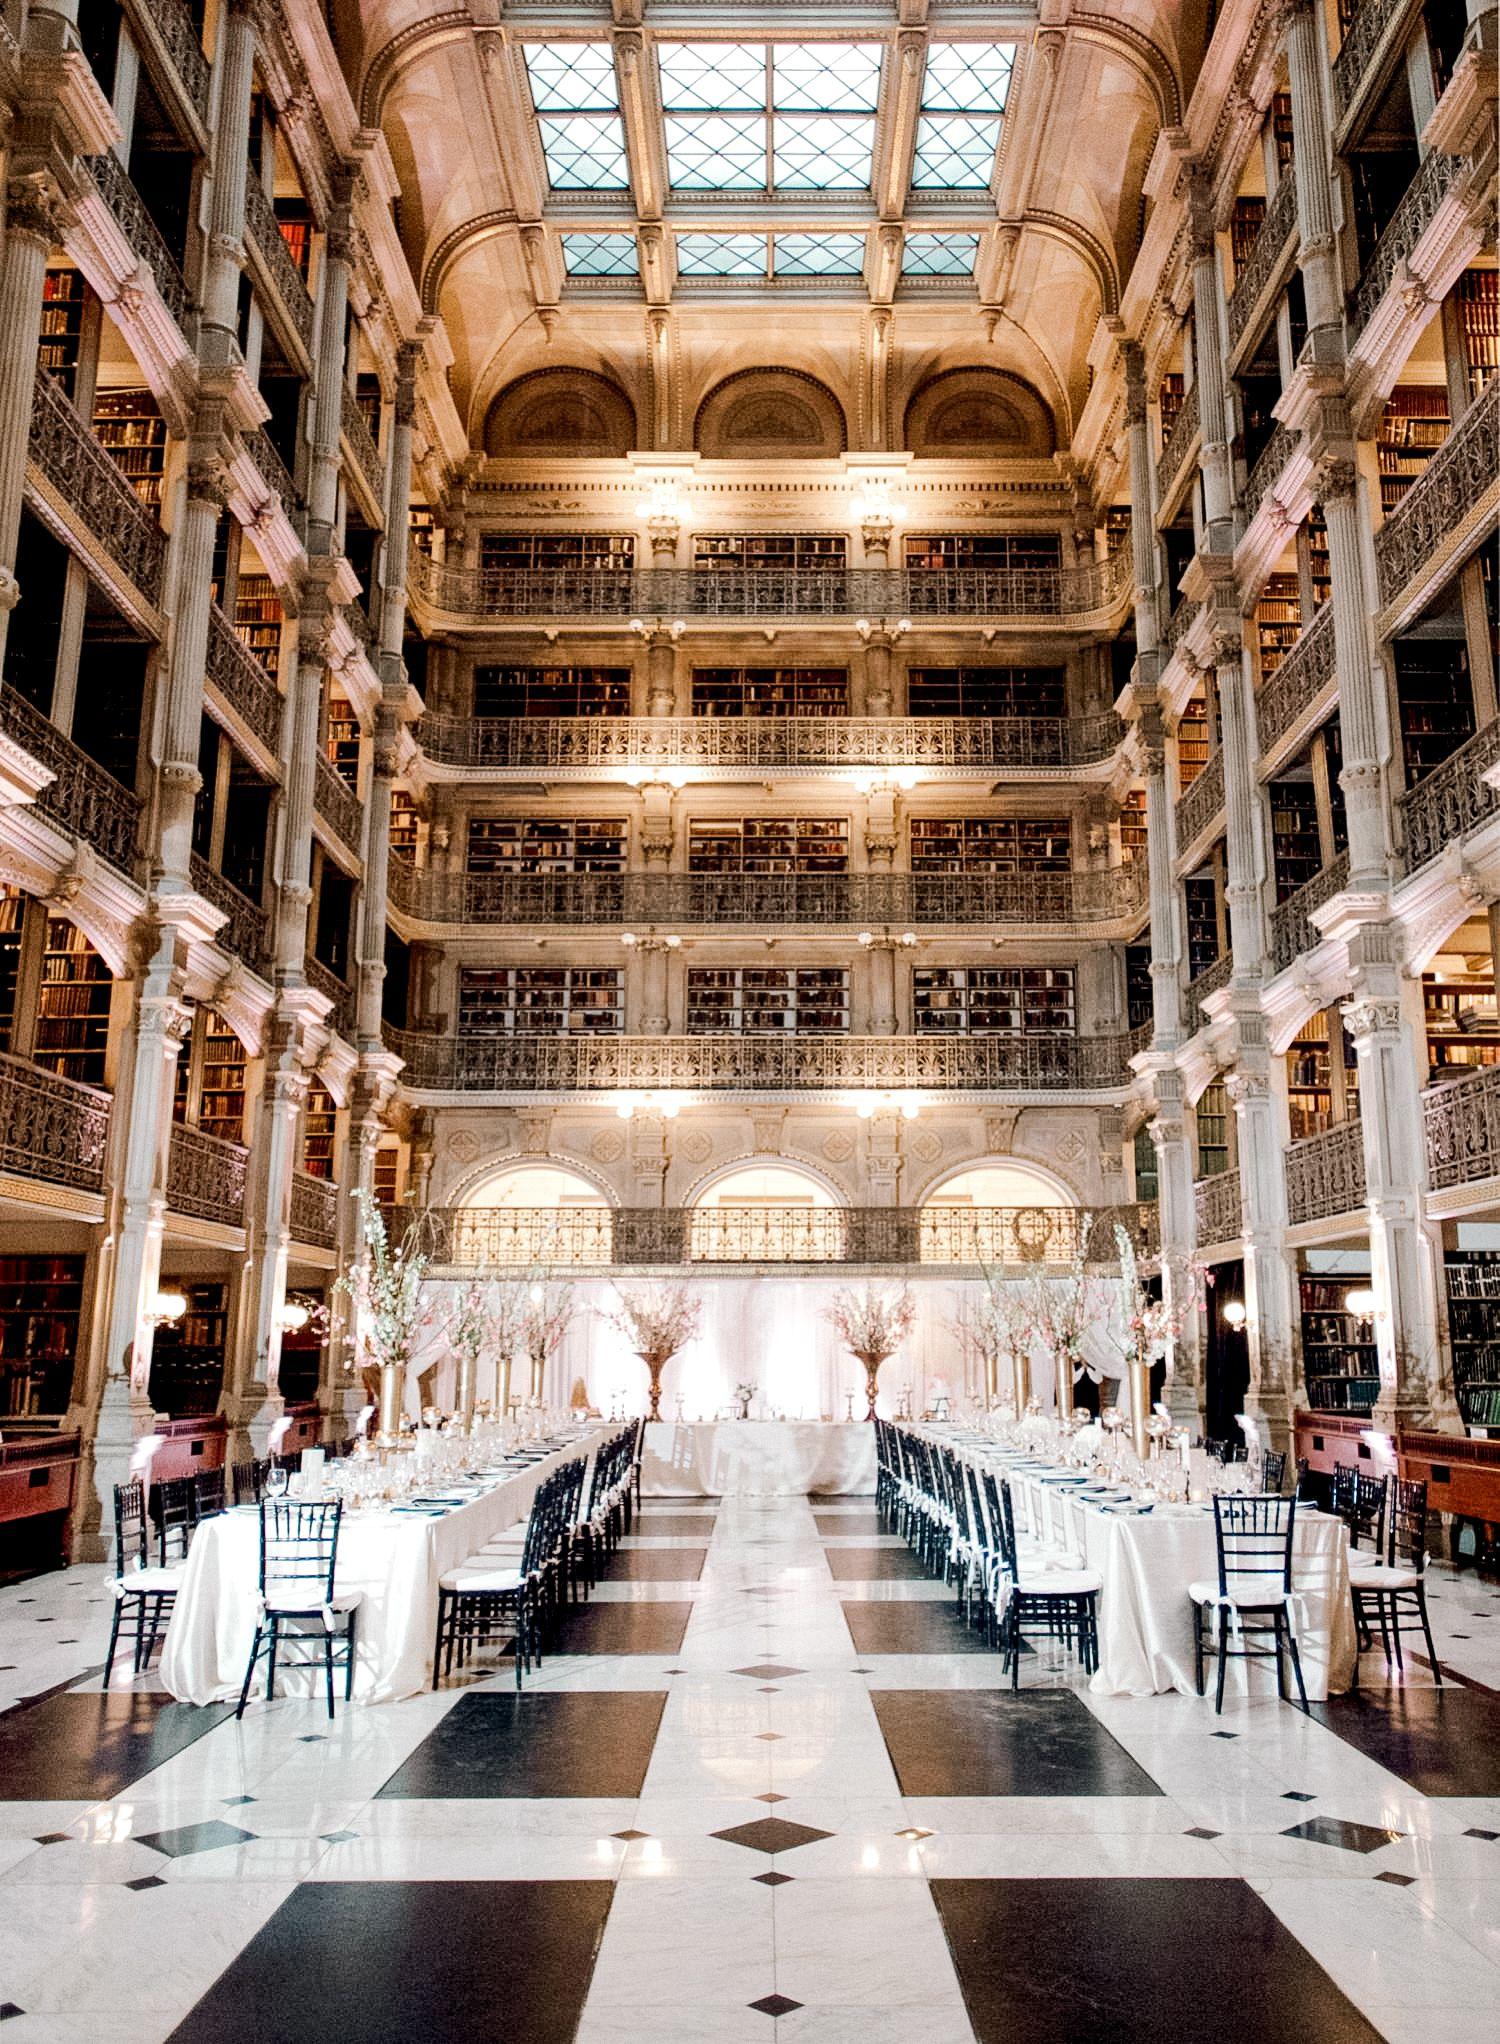 Cherry Blossom Themed Wedding At The Peabody Library George Peabody Library Peabody Library Library Wedding